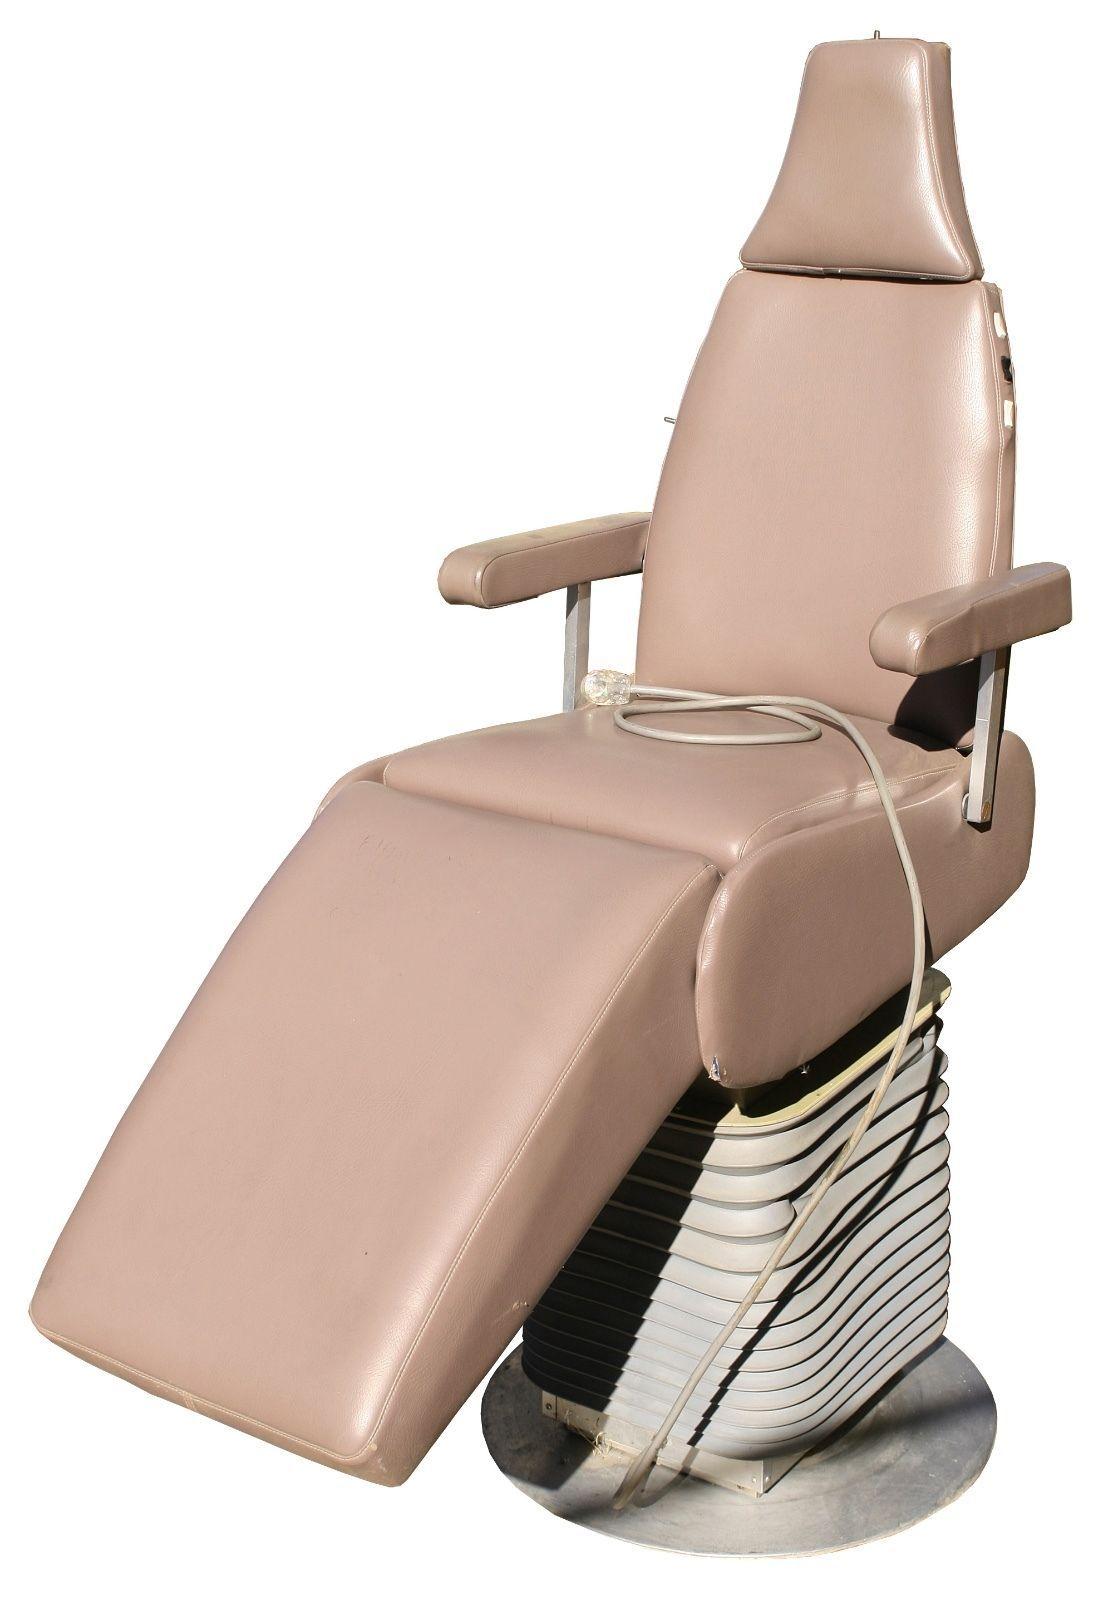 Electric chair tattoo - Electric Chair Tattoo